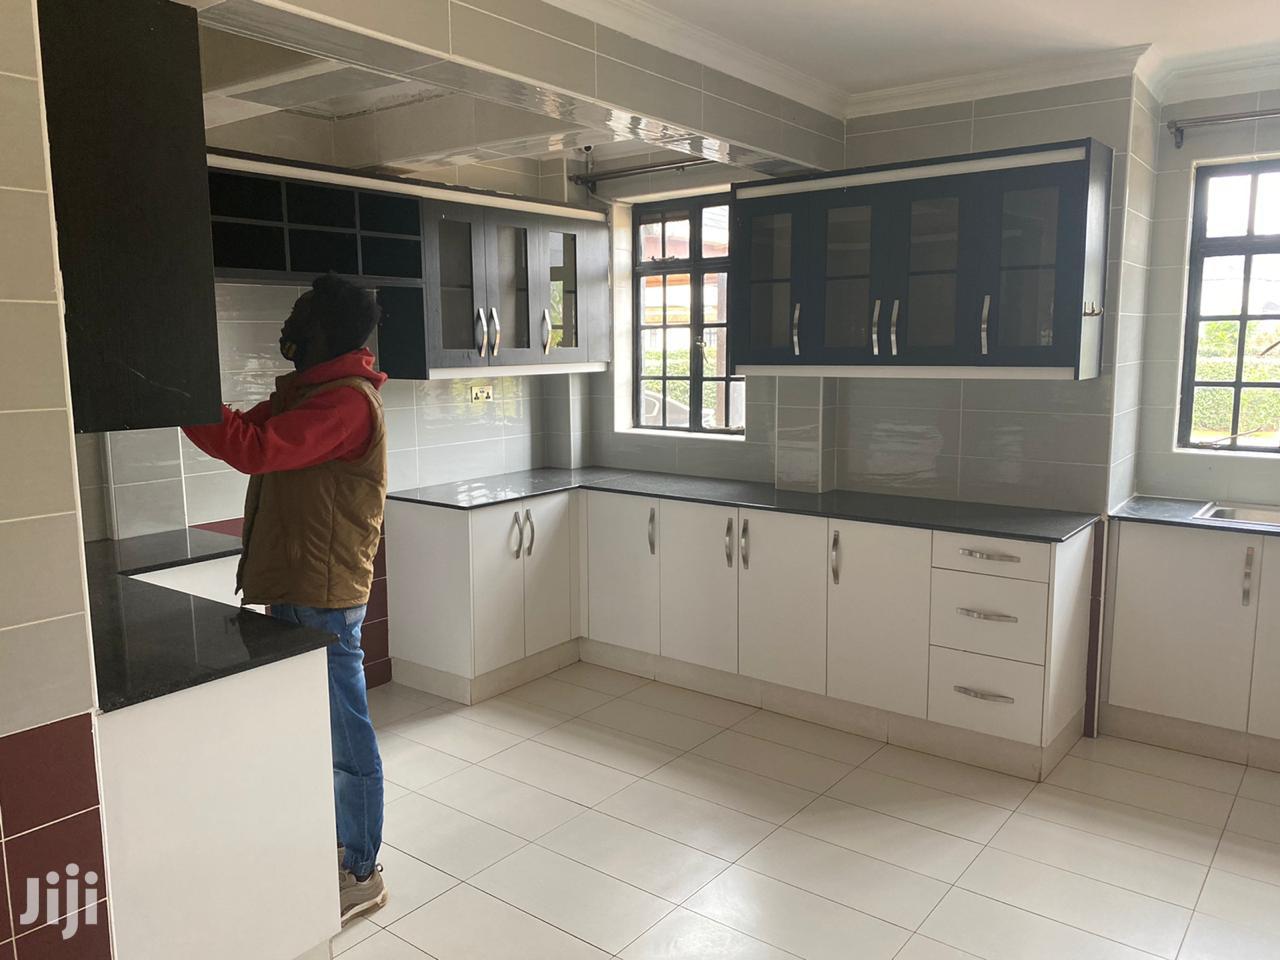 5 Bedroom All Ensuite With Dsq For Rent In Karen   Houses & Apartments For Rent for sale in Karen, Nairobi, Kenya